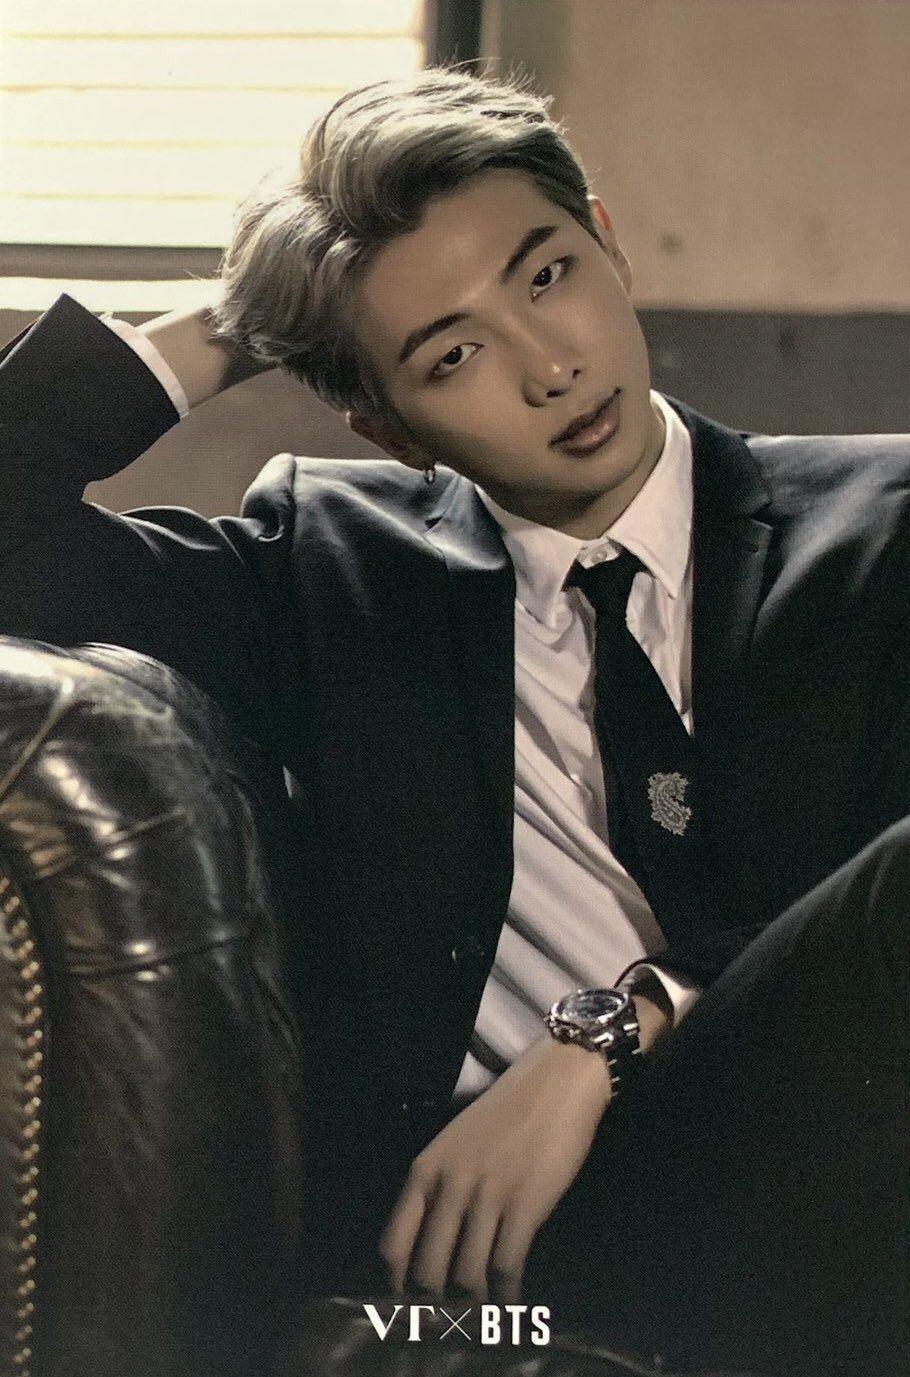 namjoon pics on Kim namjoon, Bts rap monster, Namjoon